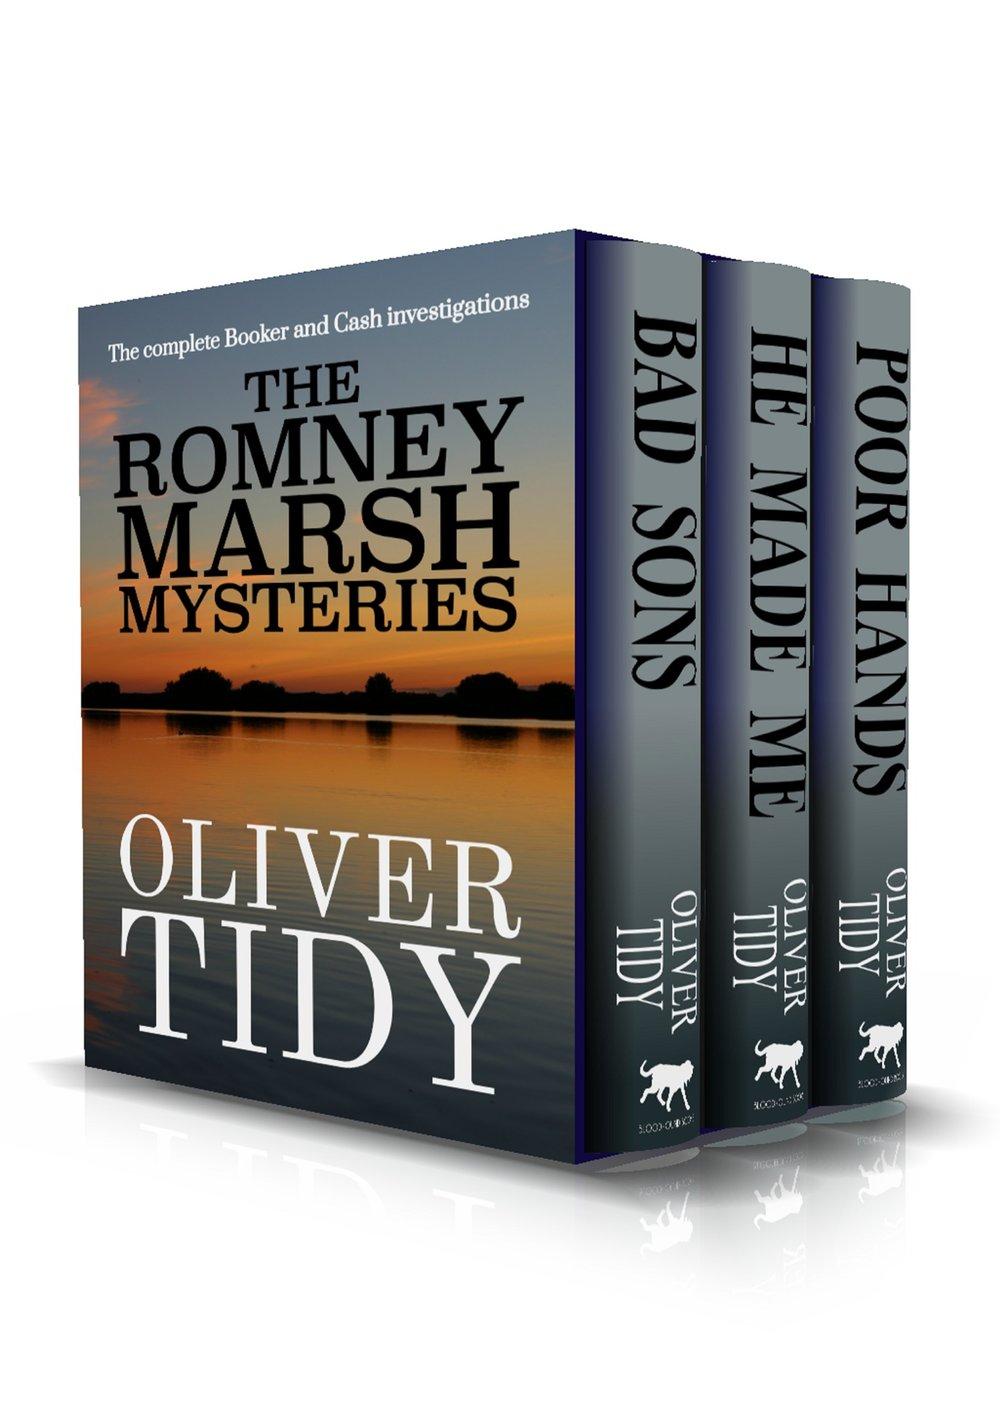 Romney Marsh Mysteries, The - Oliver Tidy.jpg